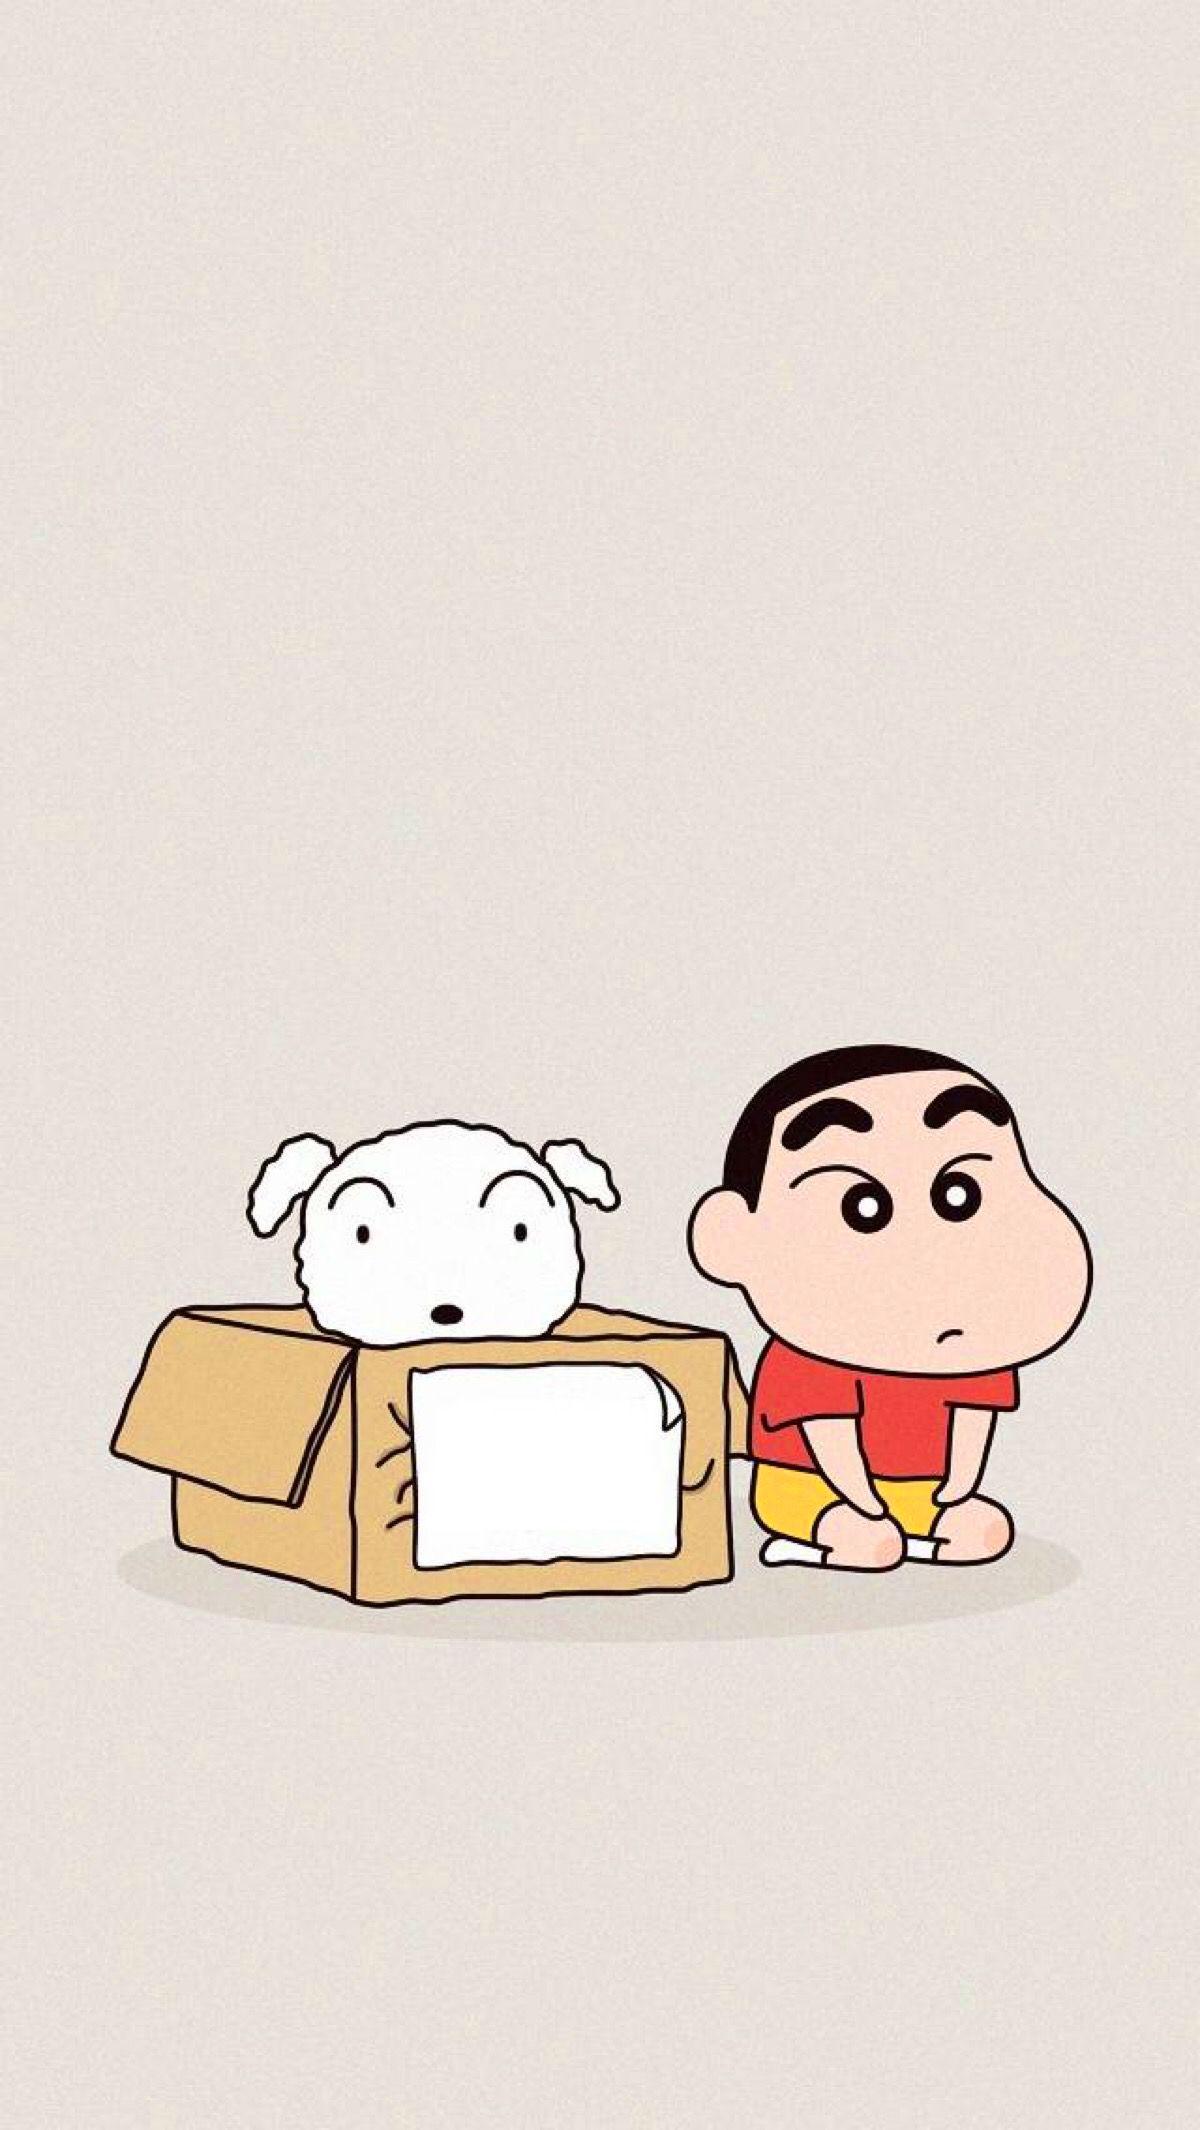 Shinchan Images for whatsapp